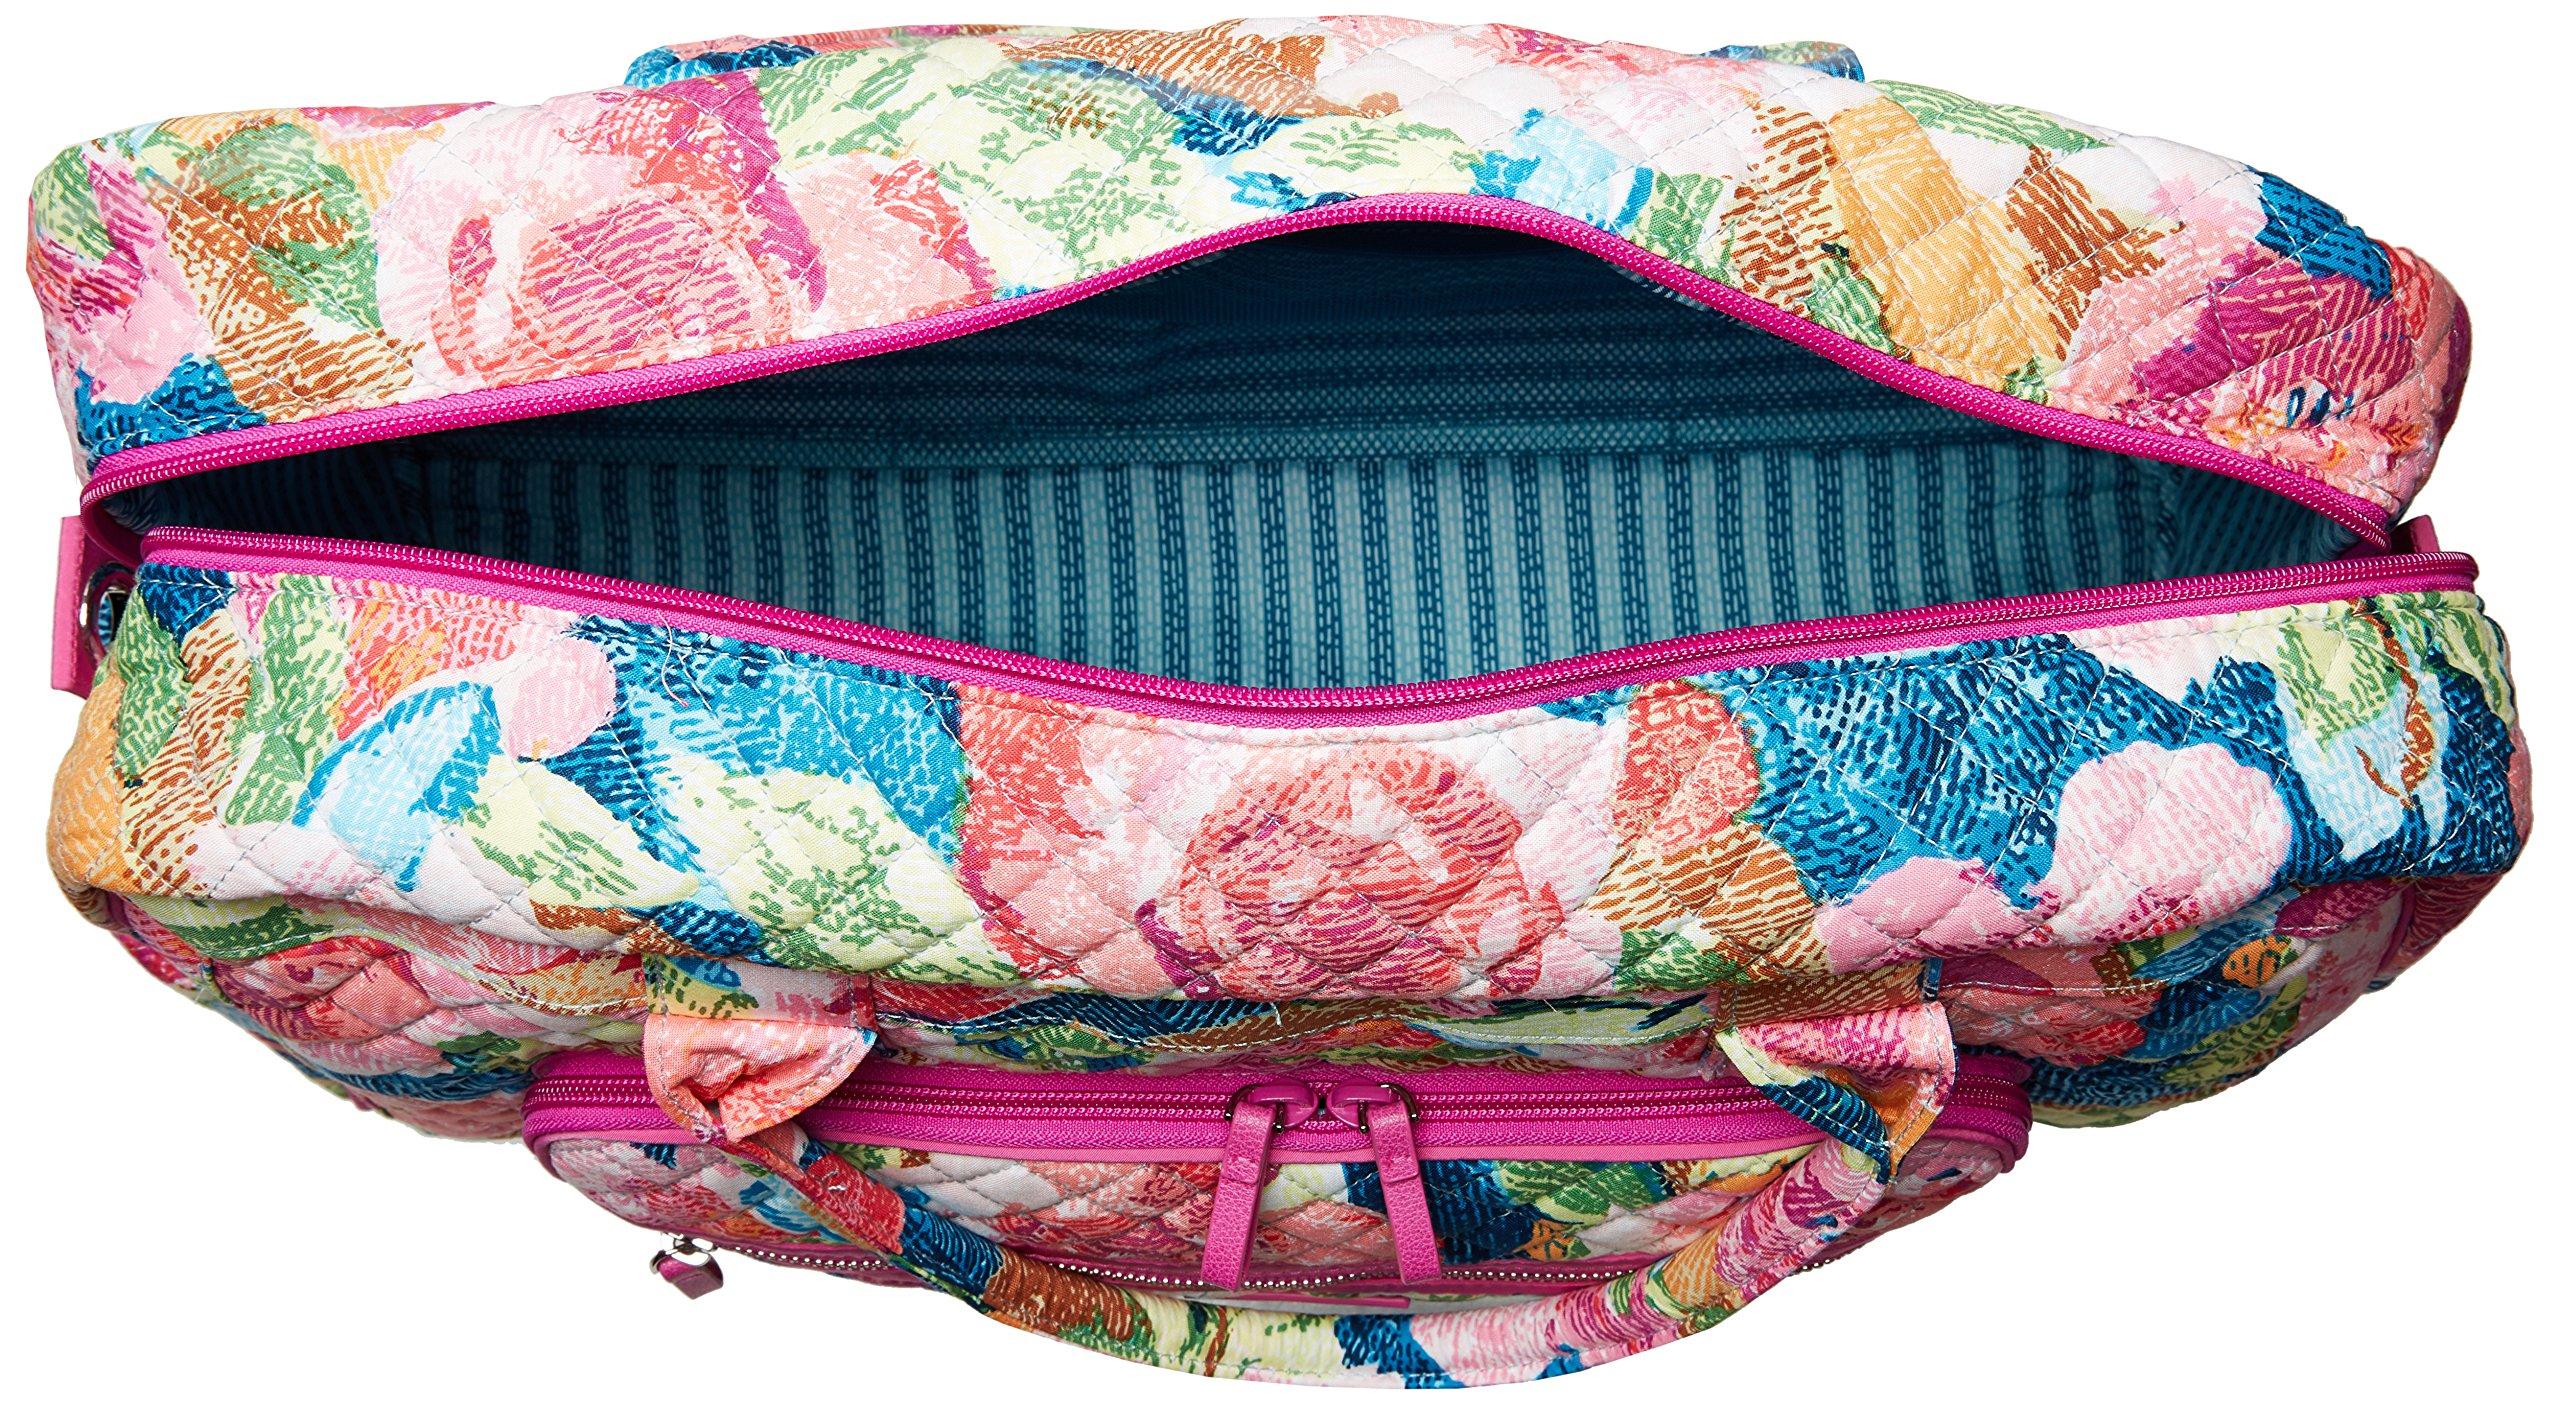 Vera Bradley Iconic Weekender Travel Bag, Signature Cotton, Superbloom by Vera Bradley (Image #6)